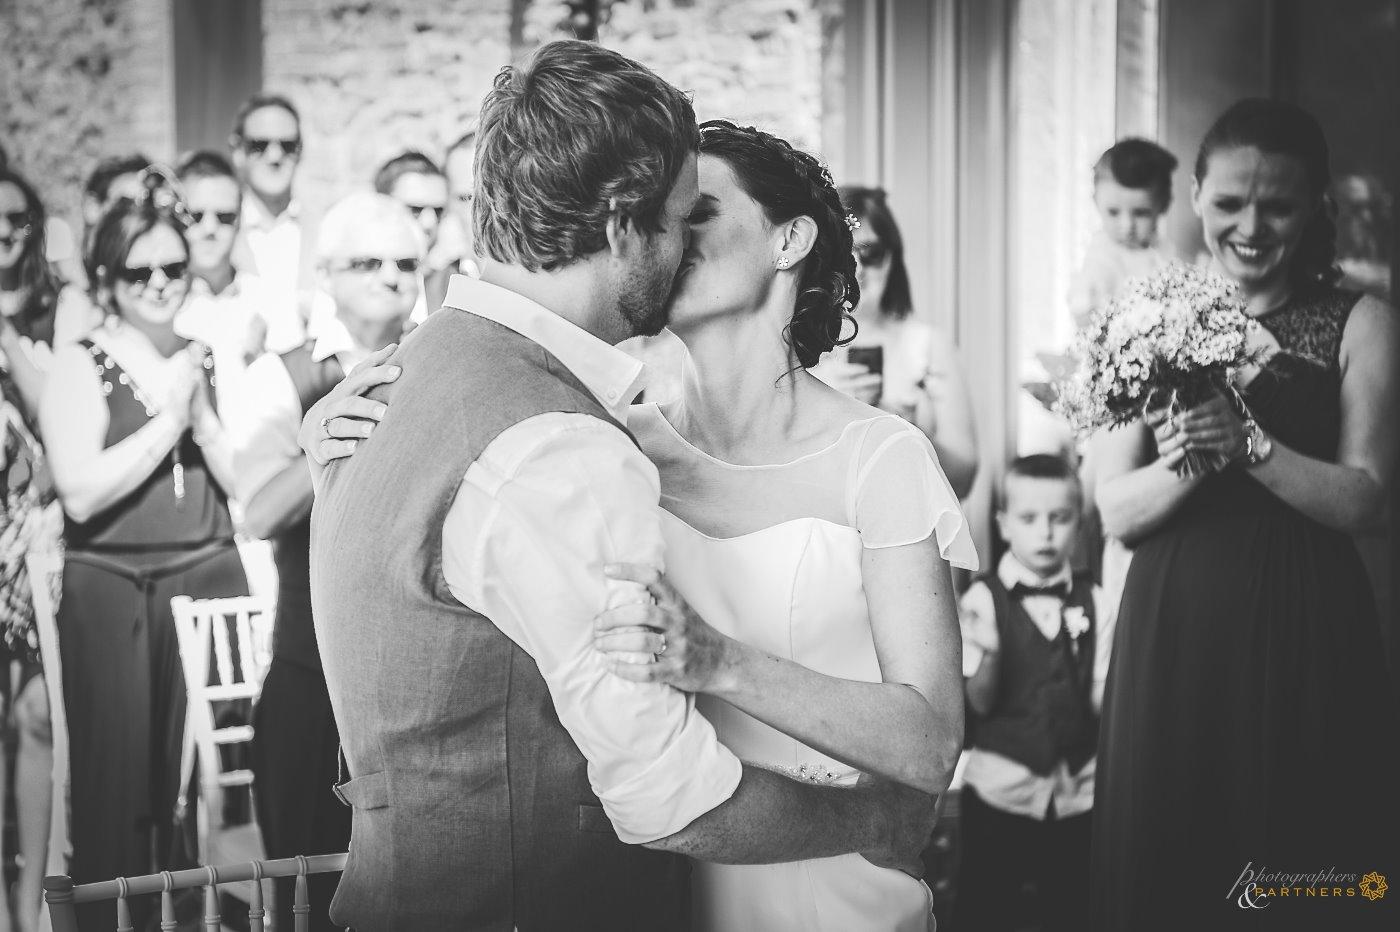 photo_weddings_castelfalfi_07.jpg